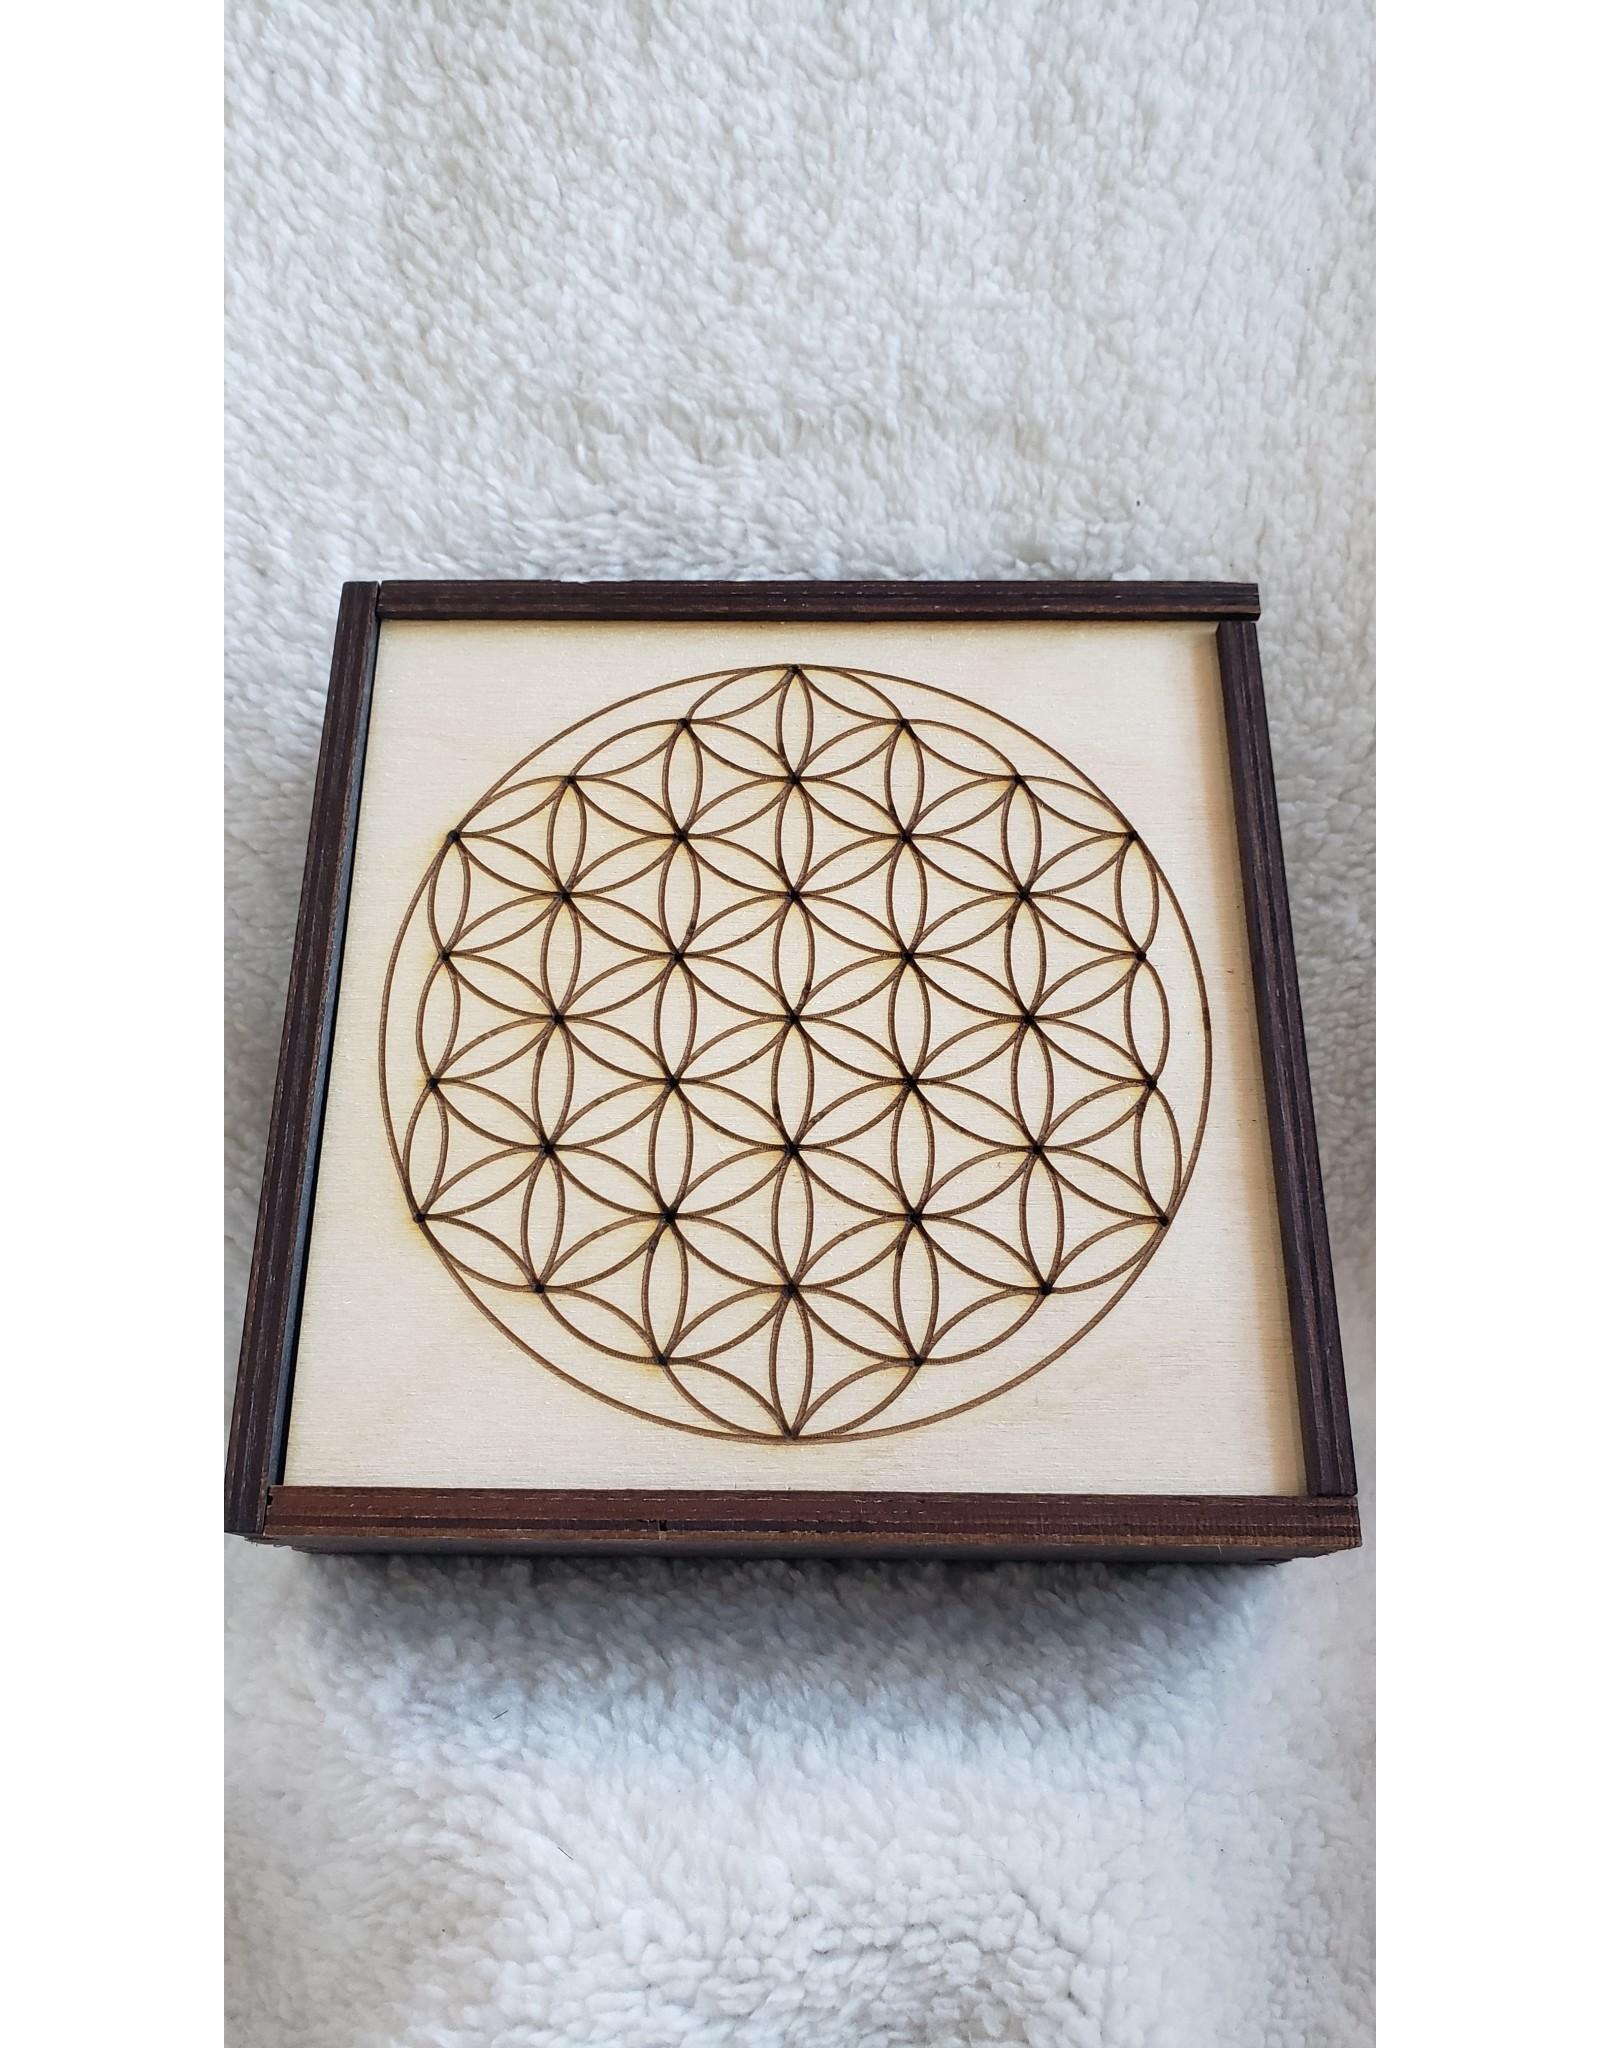 "Flower of Life Crystal Grid Box | 6"" x 6"""